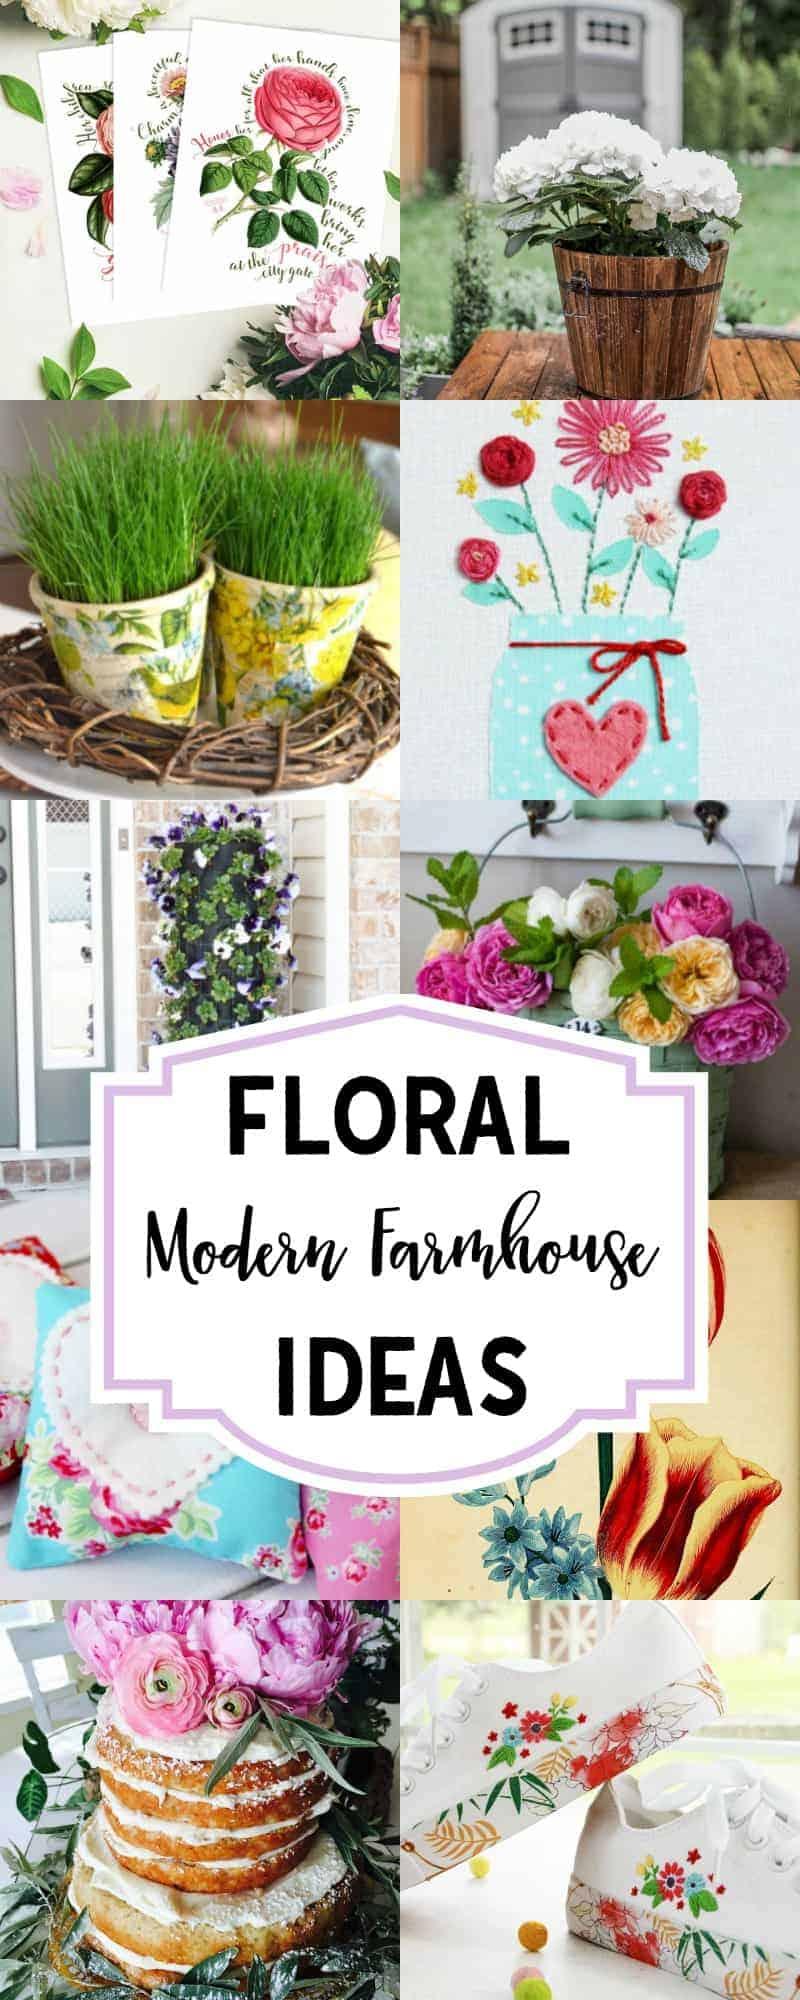 collage of floral modern farmhouse decor ideas